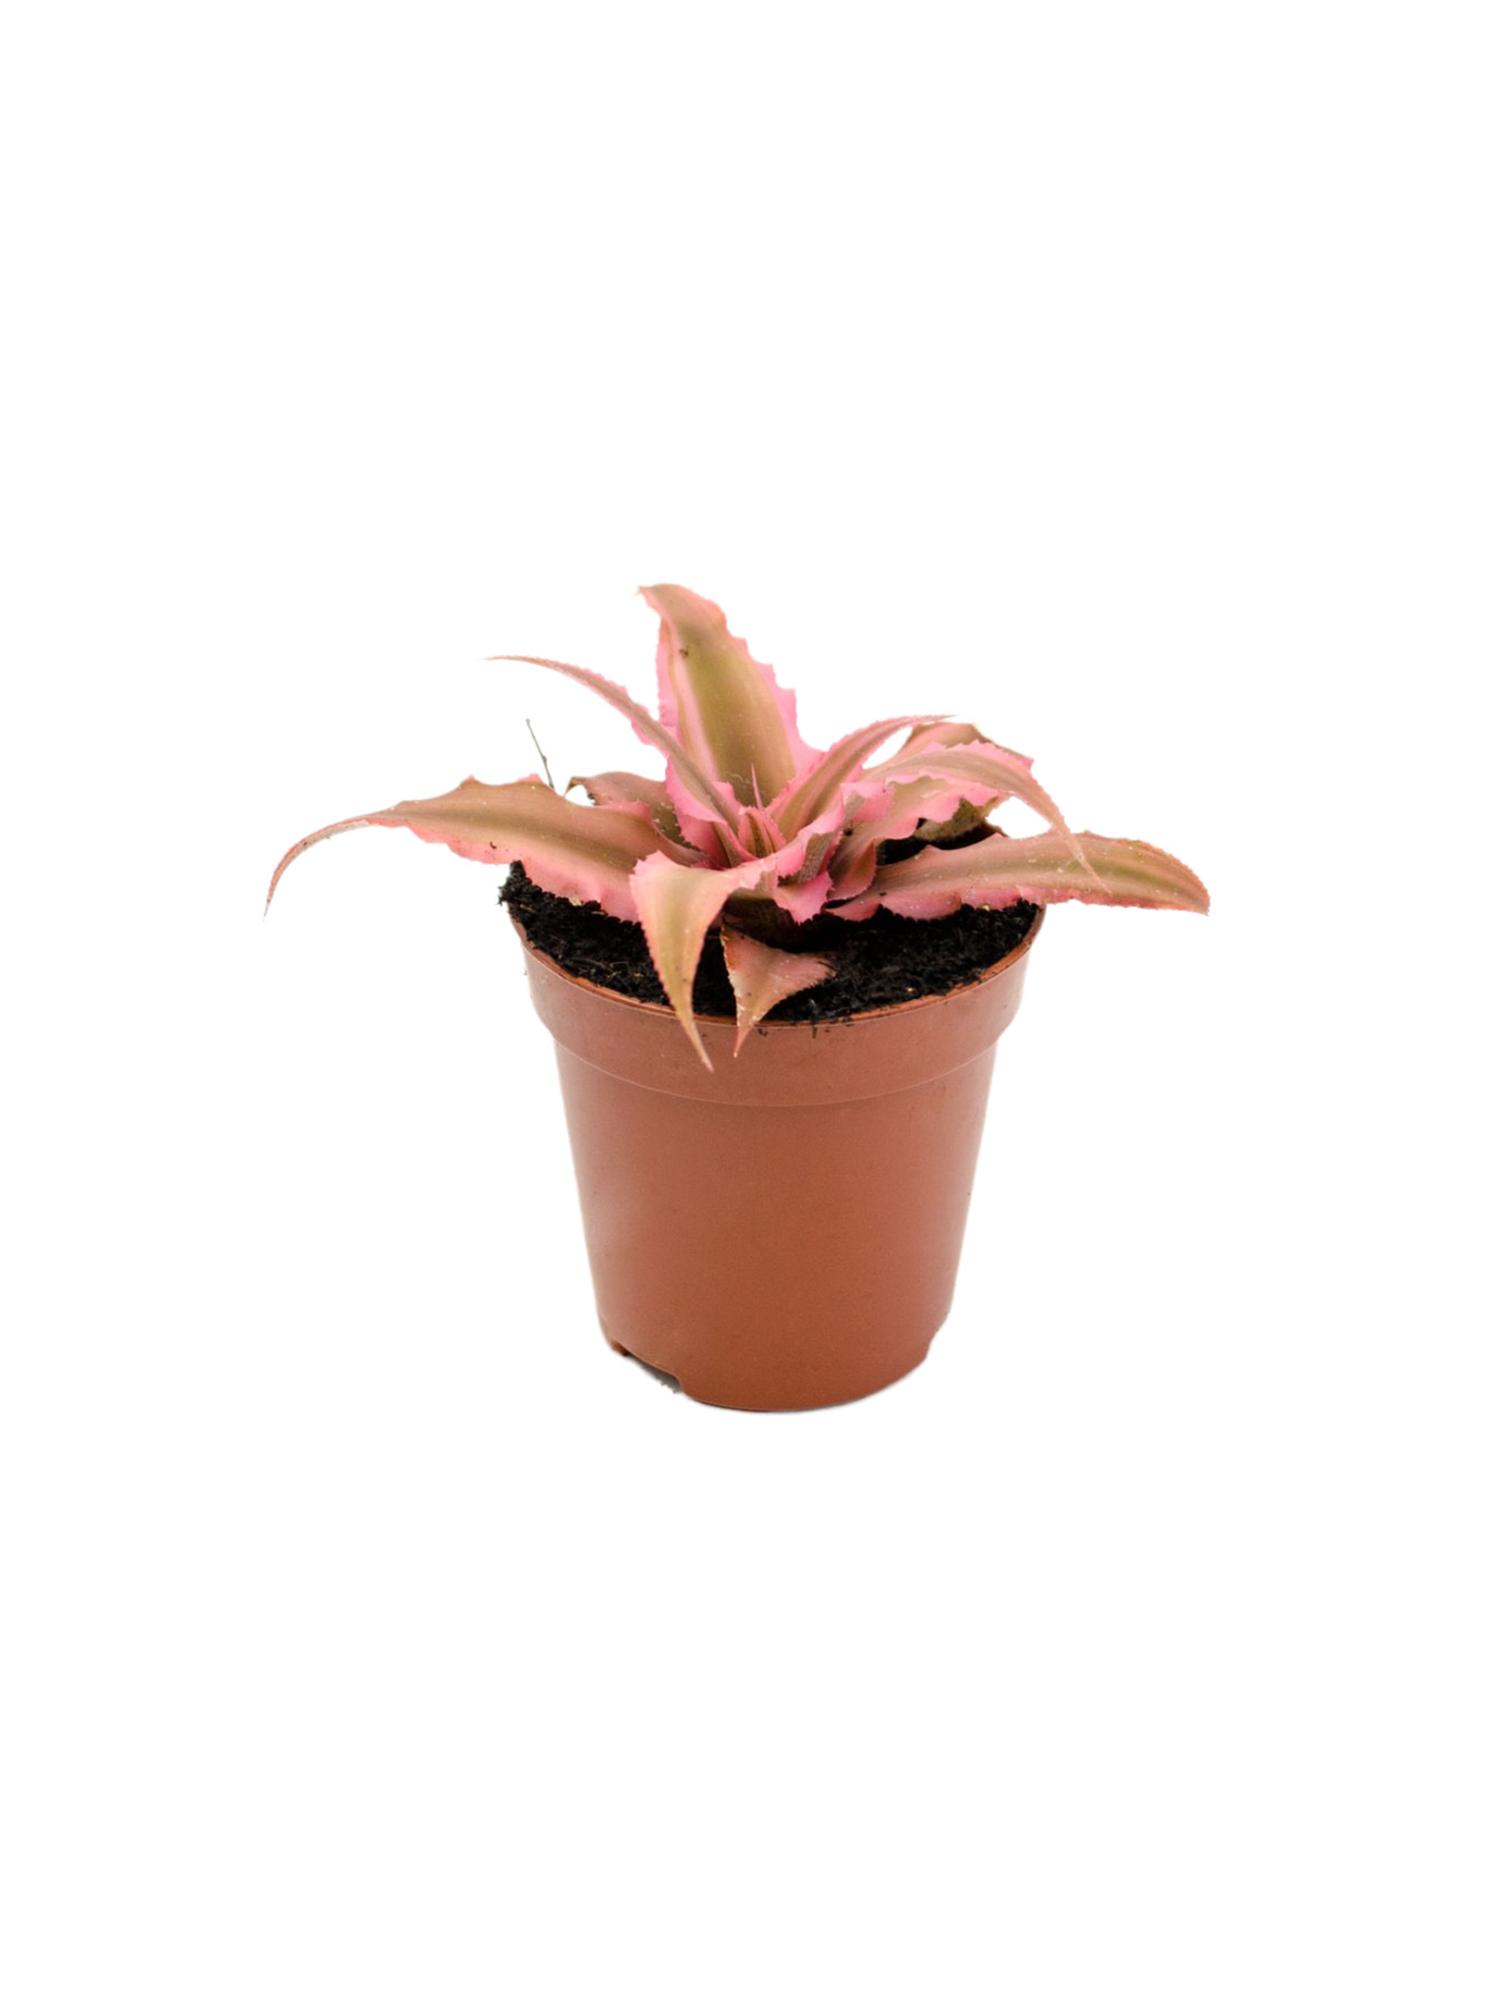 Криптантус рубиновая звезда (Cryptanthus rubin star)